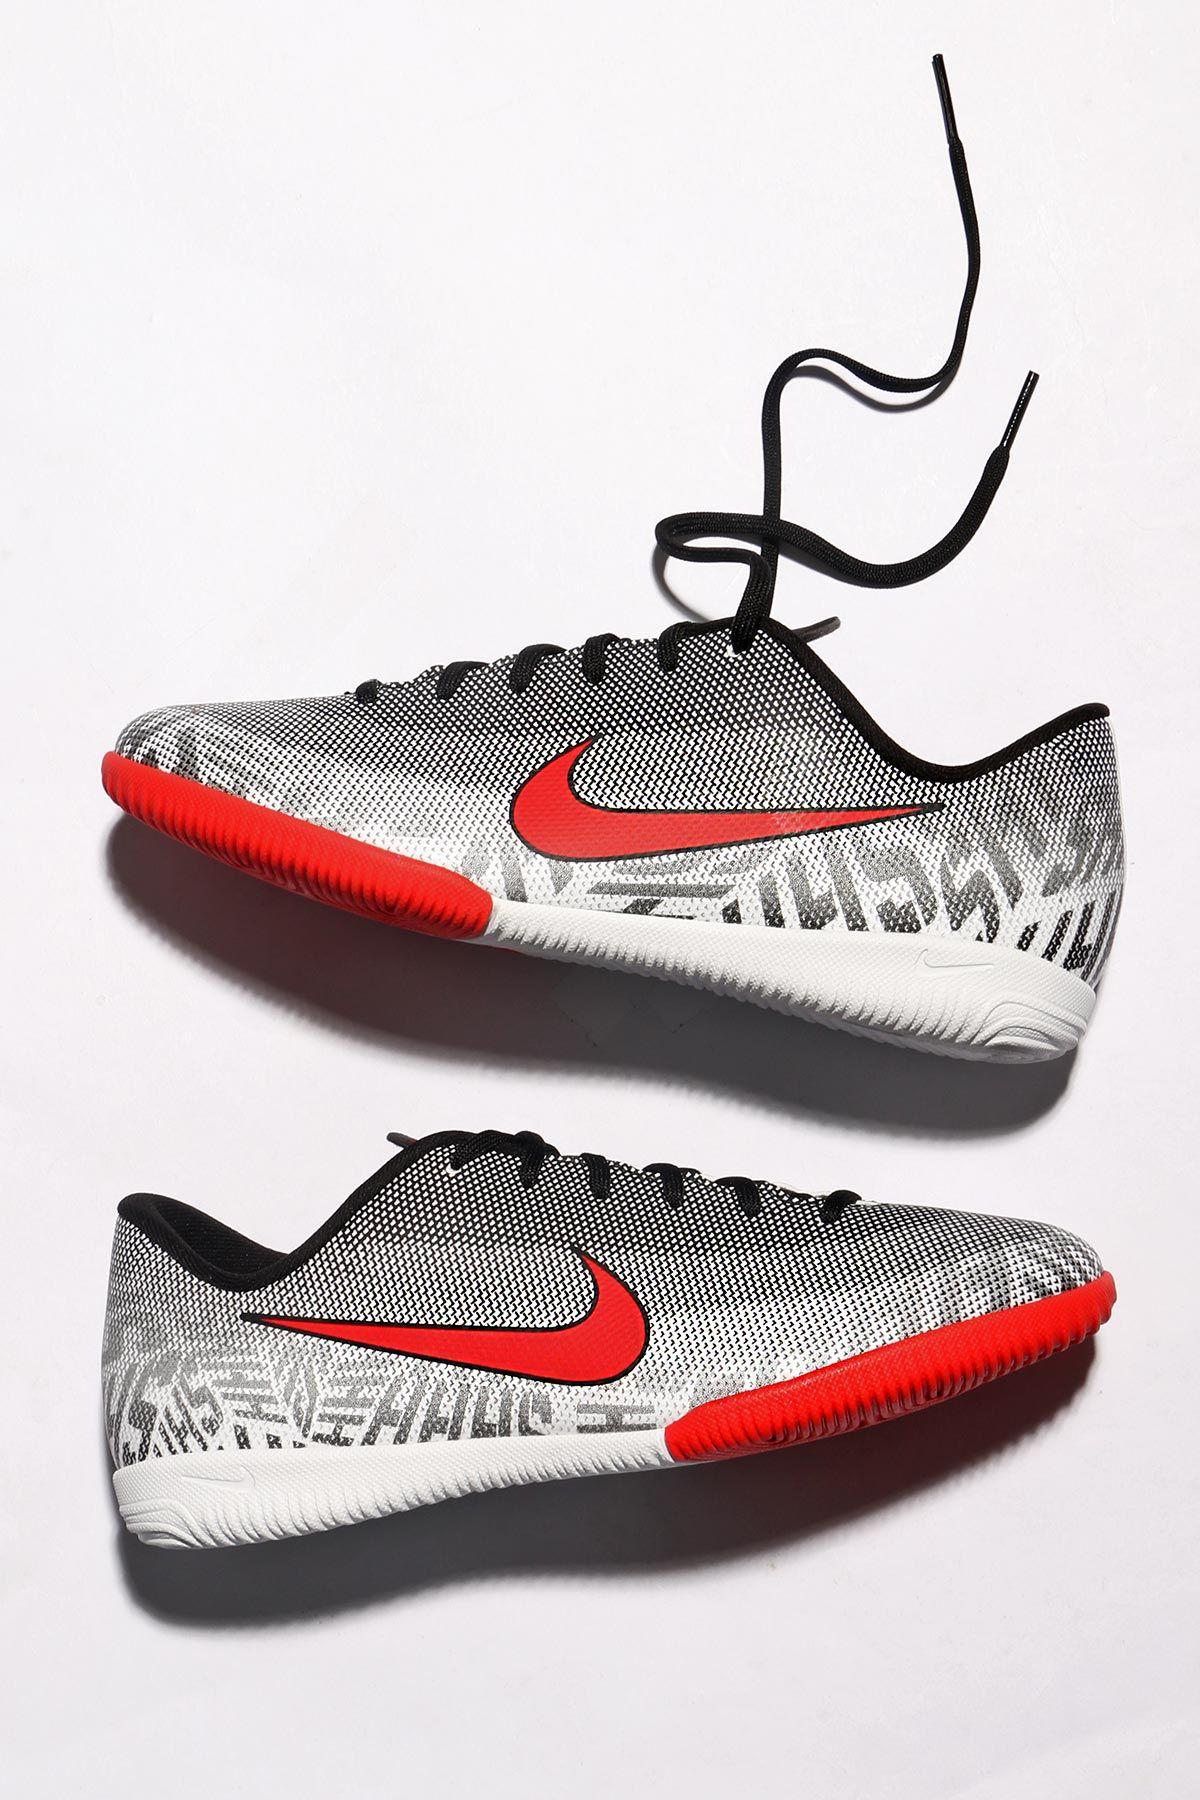 b72d8f335a2 📌Nike Jr. Mercurial Vapor XII Academy NJR IC📌 Nuevas botas de fútbol Nike